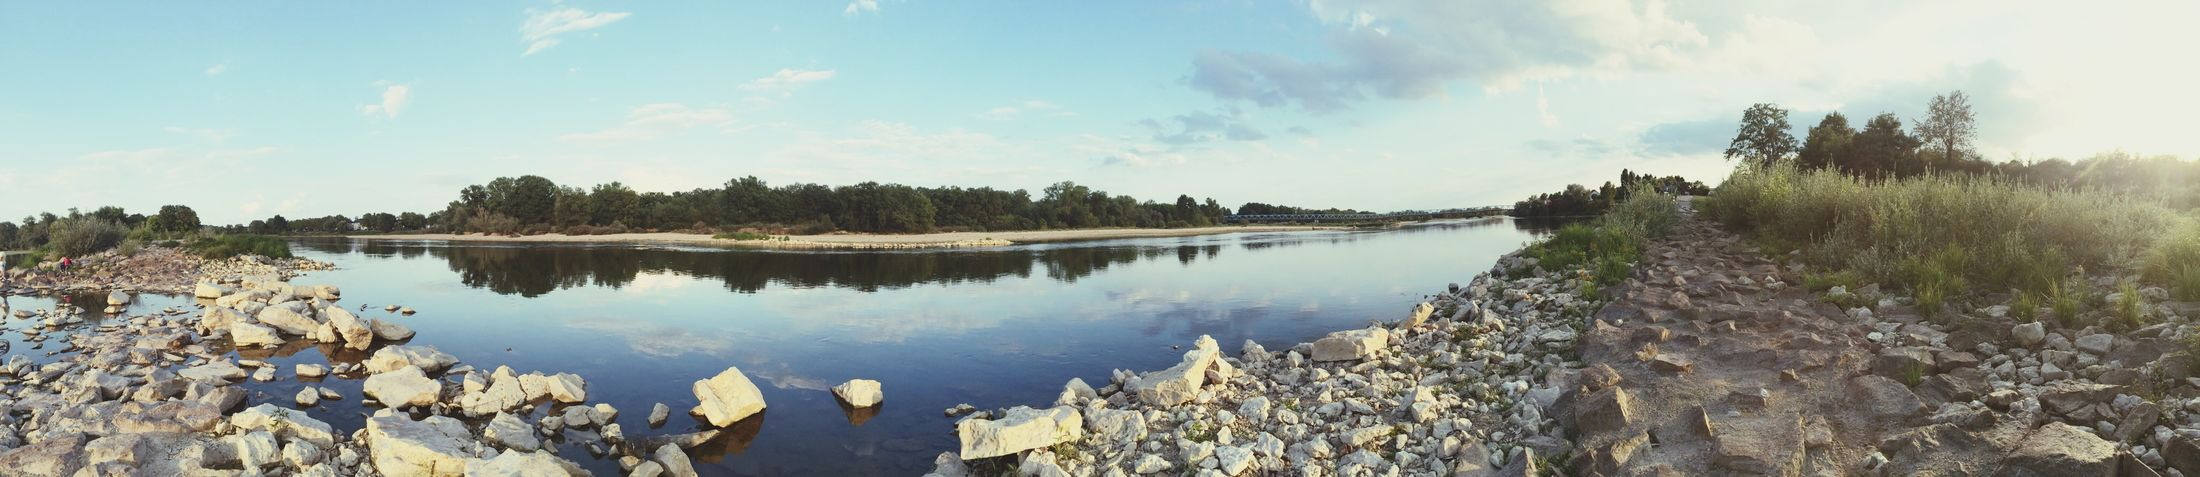 Summer ☀ Iphone5s Loire First Eyeem Photo